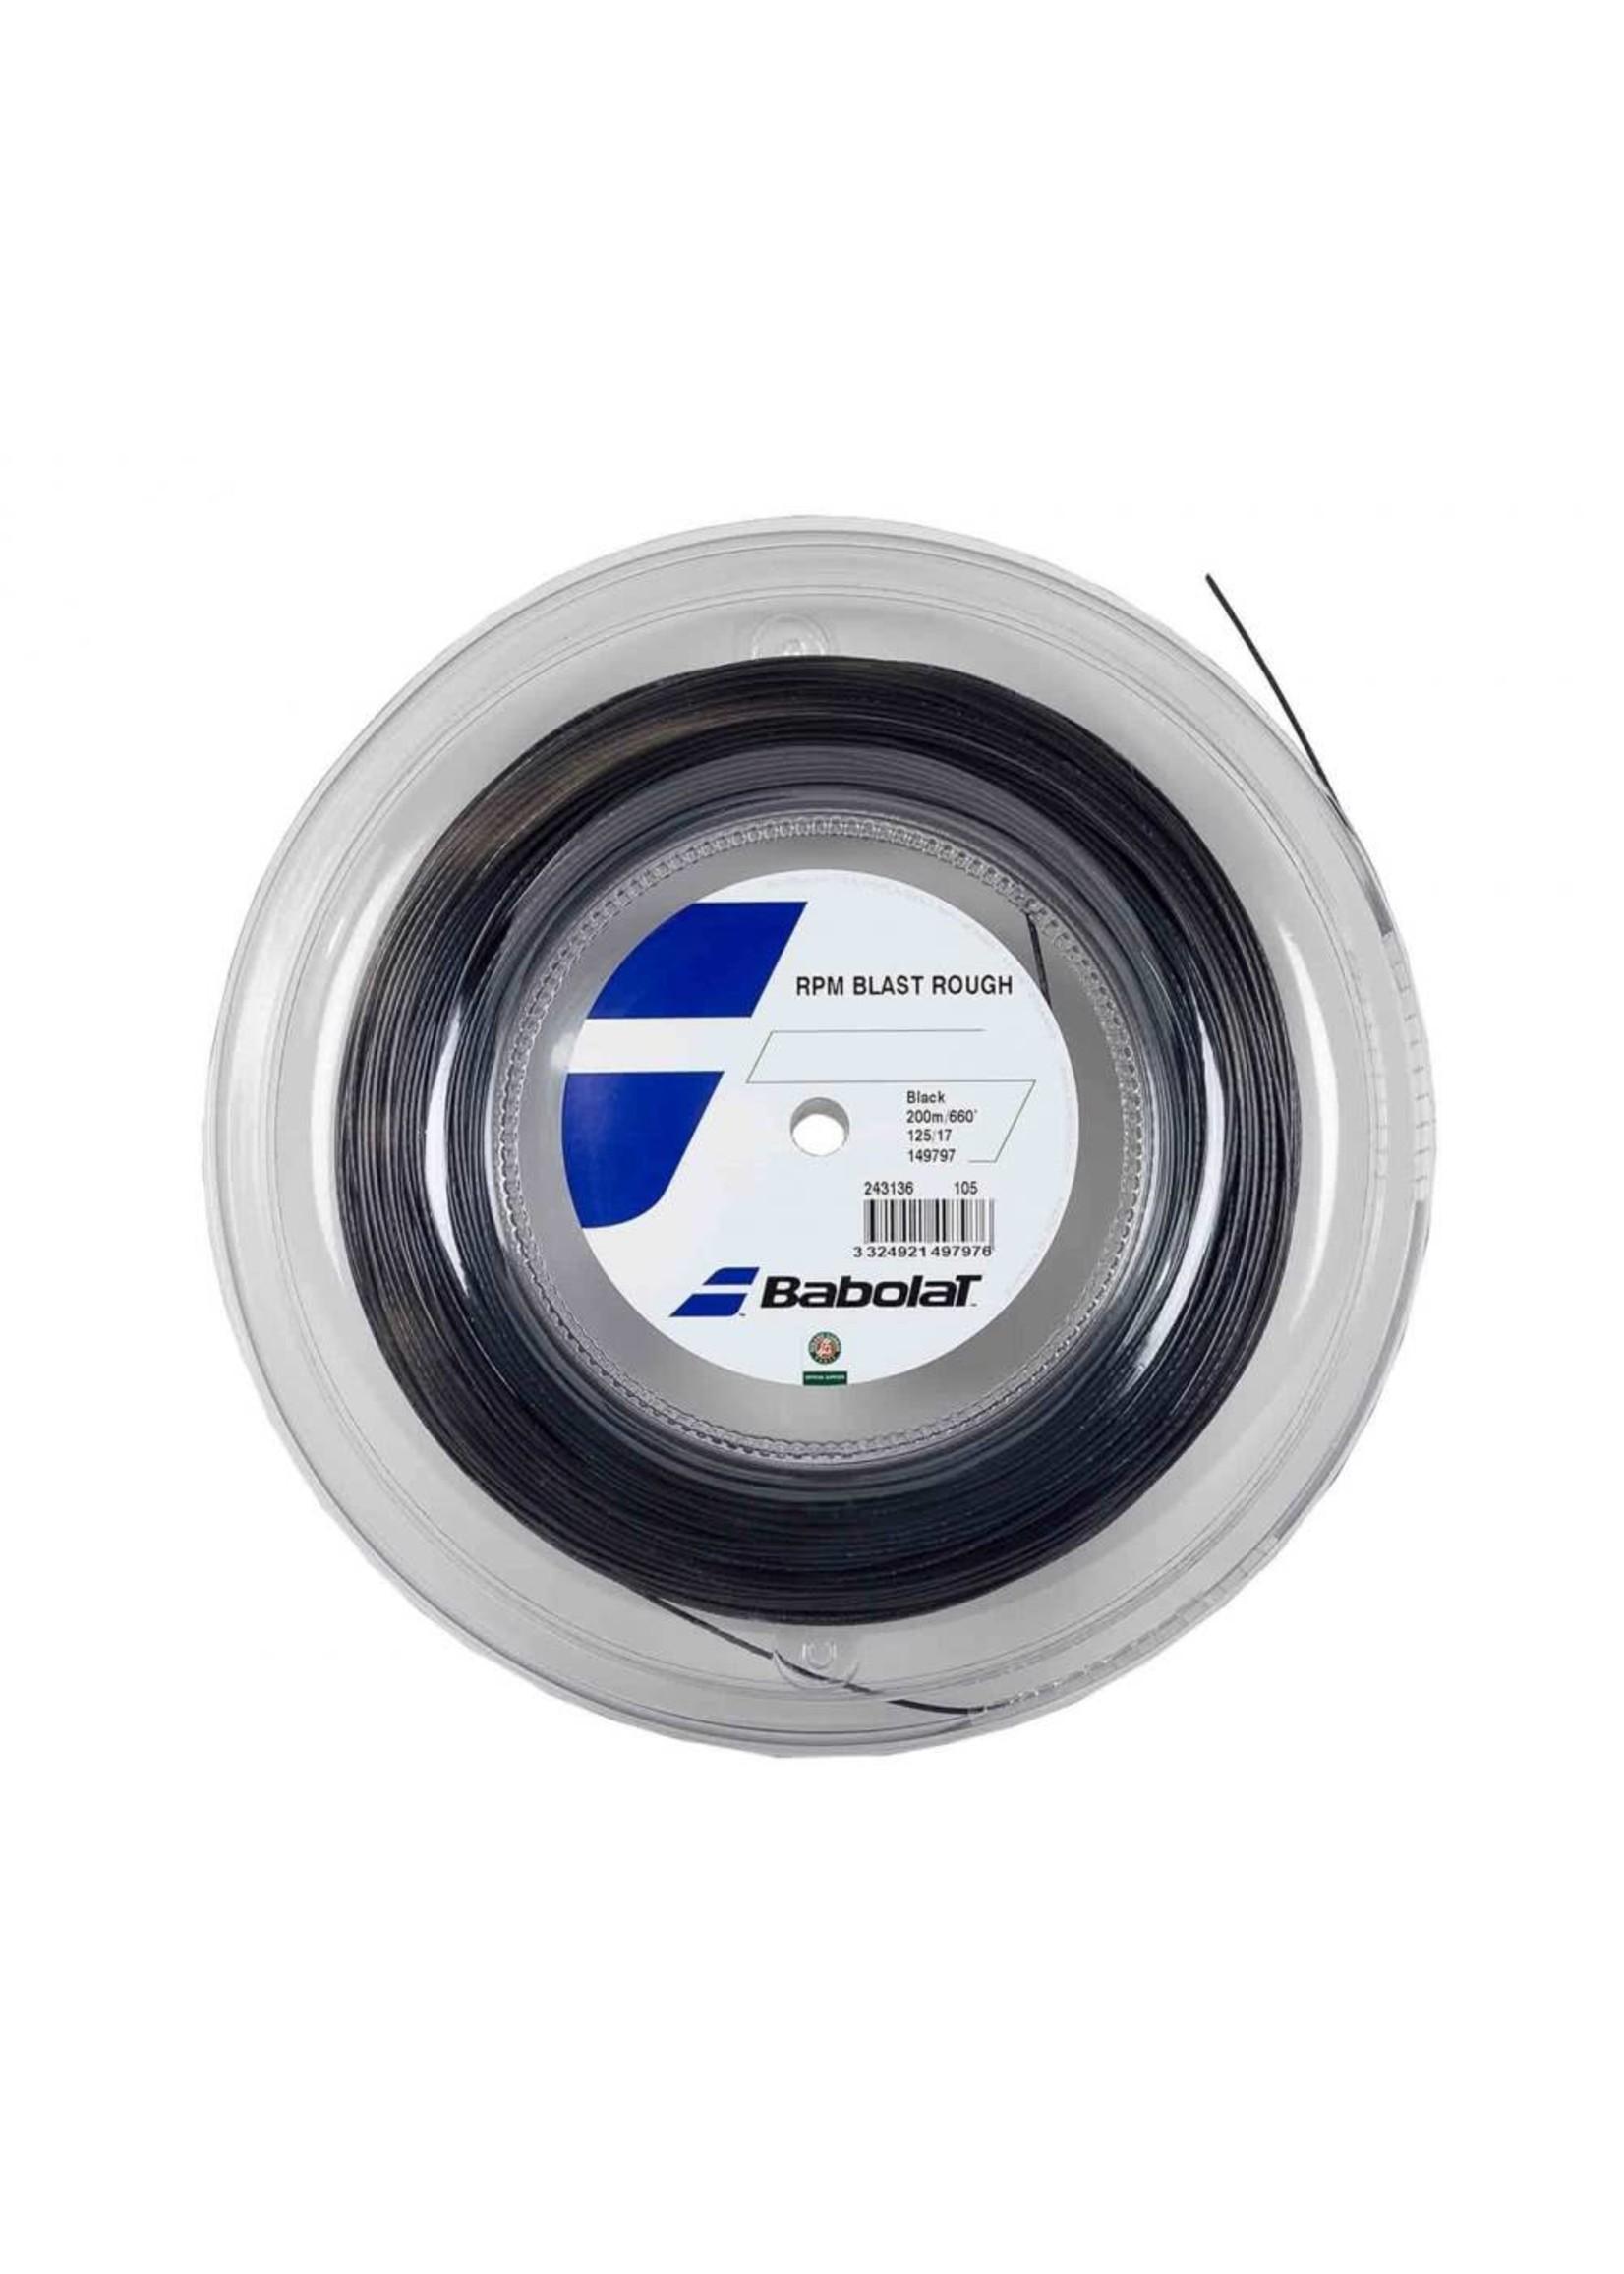 Babolat RPM Rough 125 Tennis String (Black) - 200m Reel